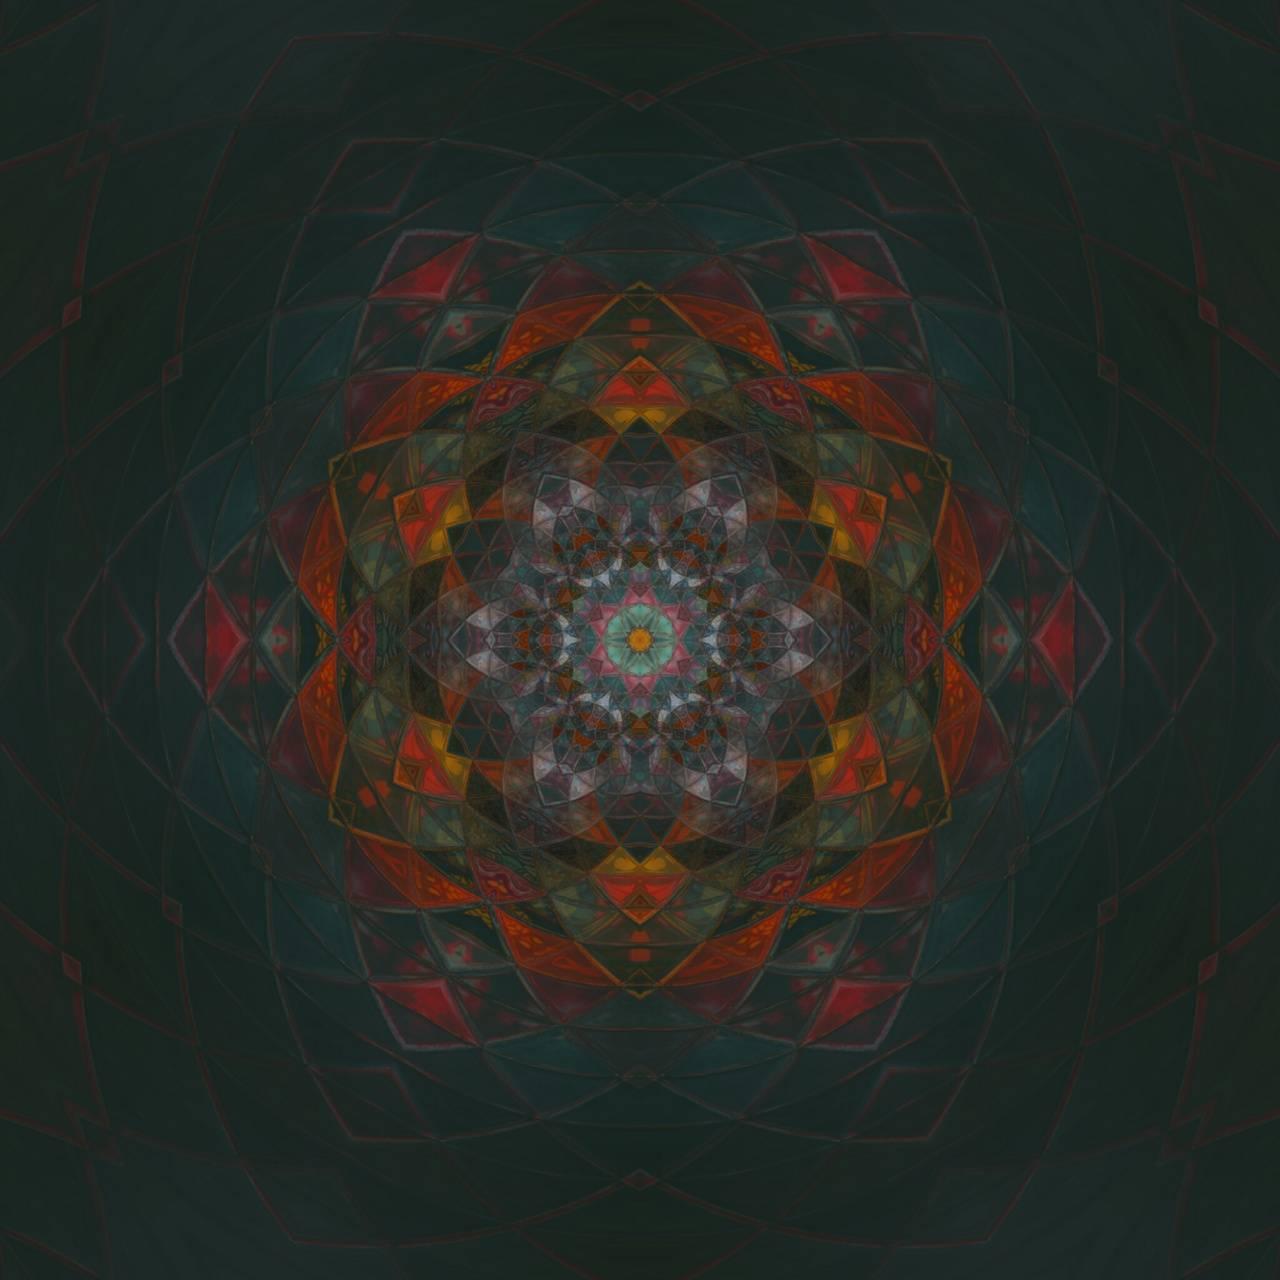 Friendly fractal